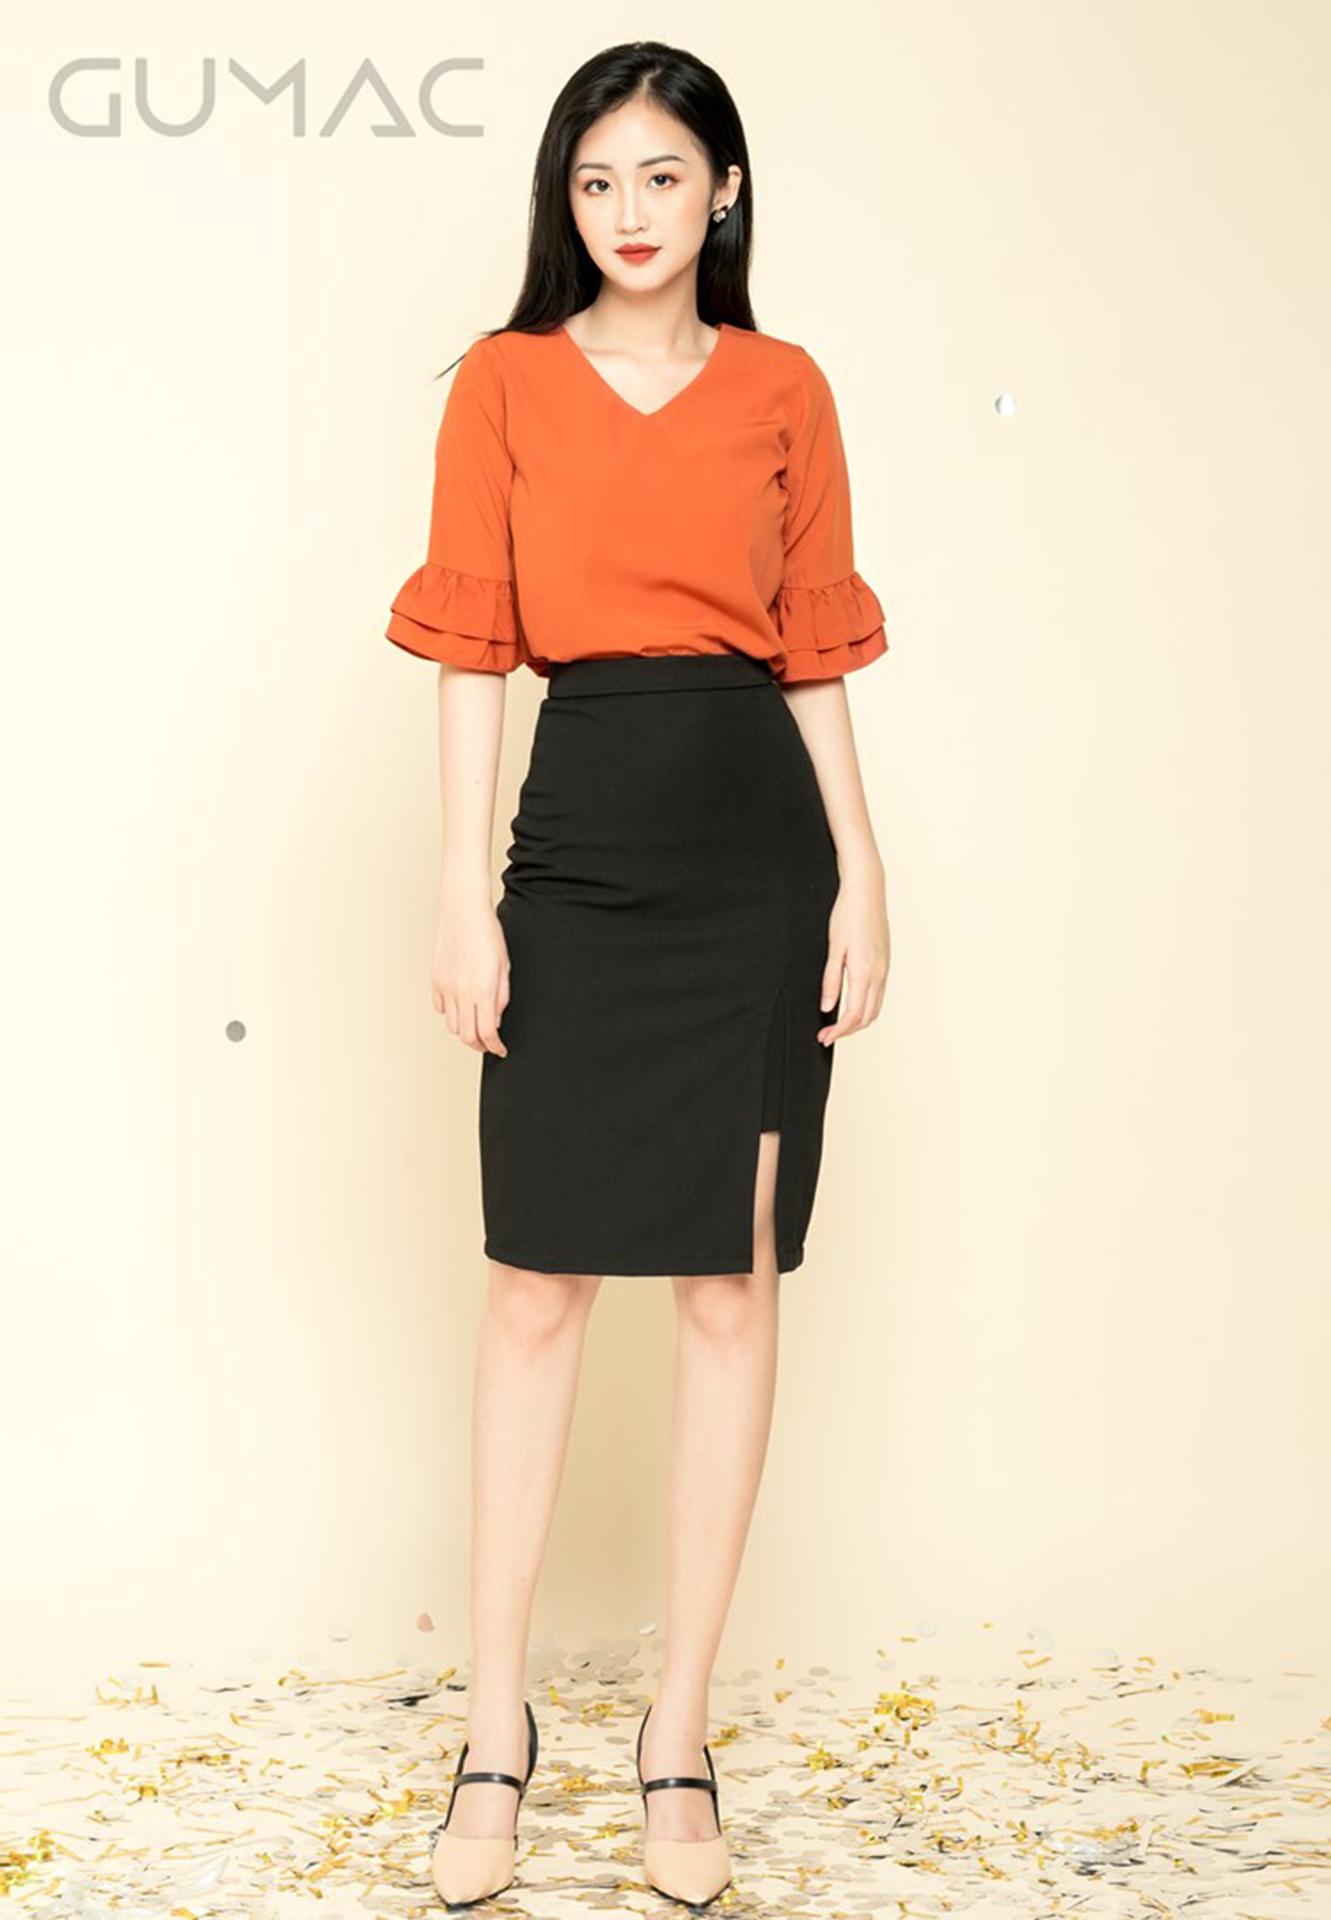 60f02cf344 Free Images : office, shirt, trousers, clothing, Pencil skirt, orange,  waist, shoulder, fashion model, neck, joint, footwear, knee, leg, sleeve,  formal wear ...